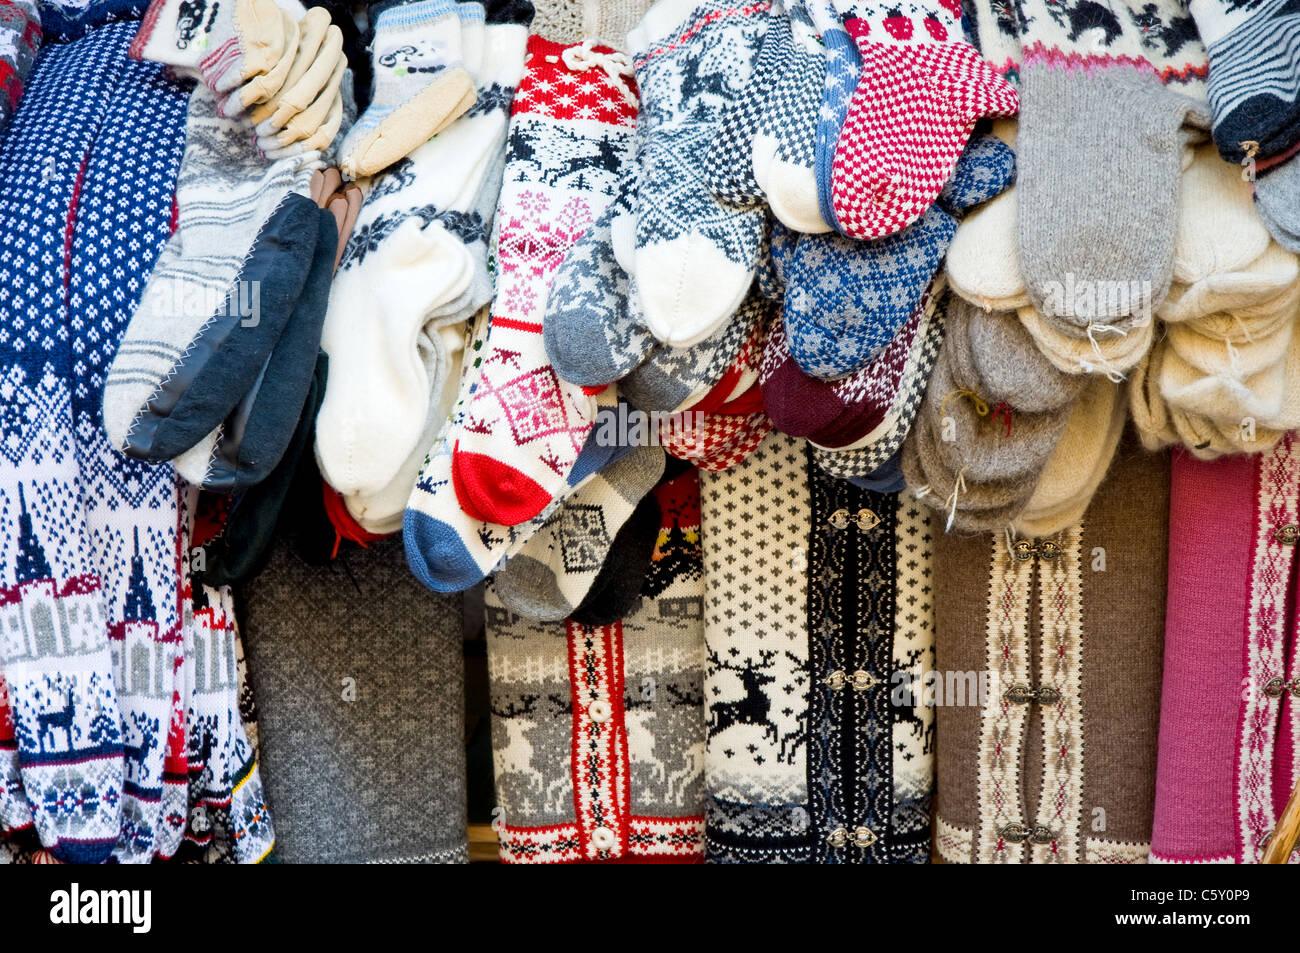 Local handicrafts, Tallinn, Estonia - Stock Image